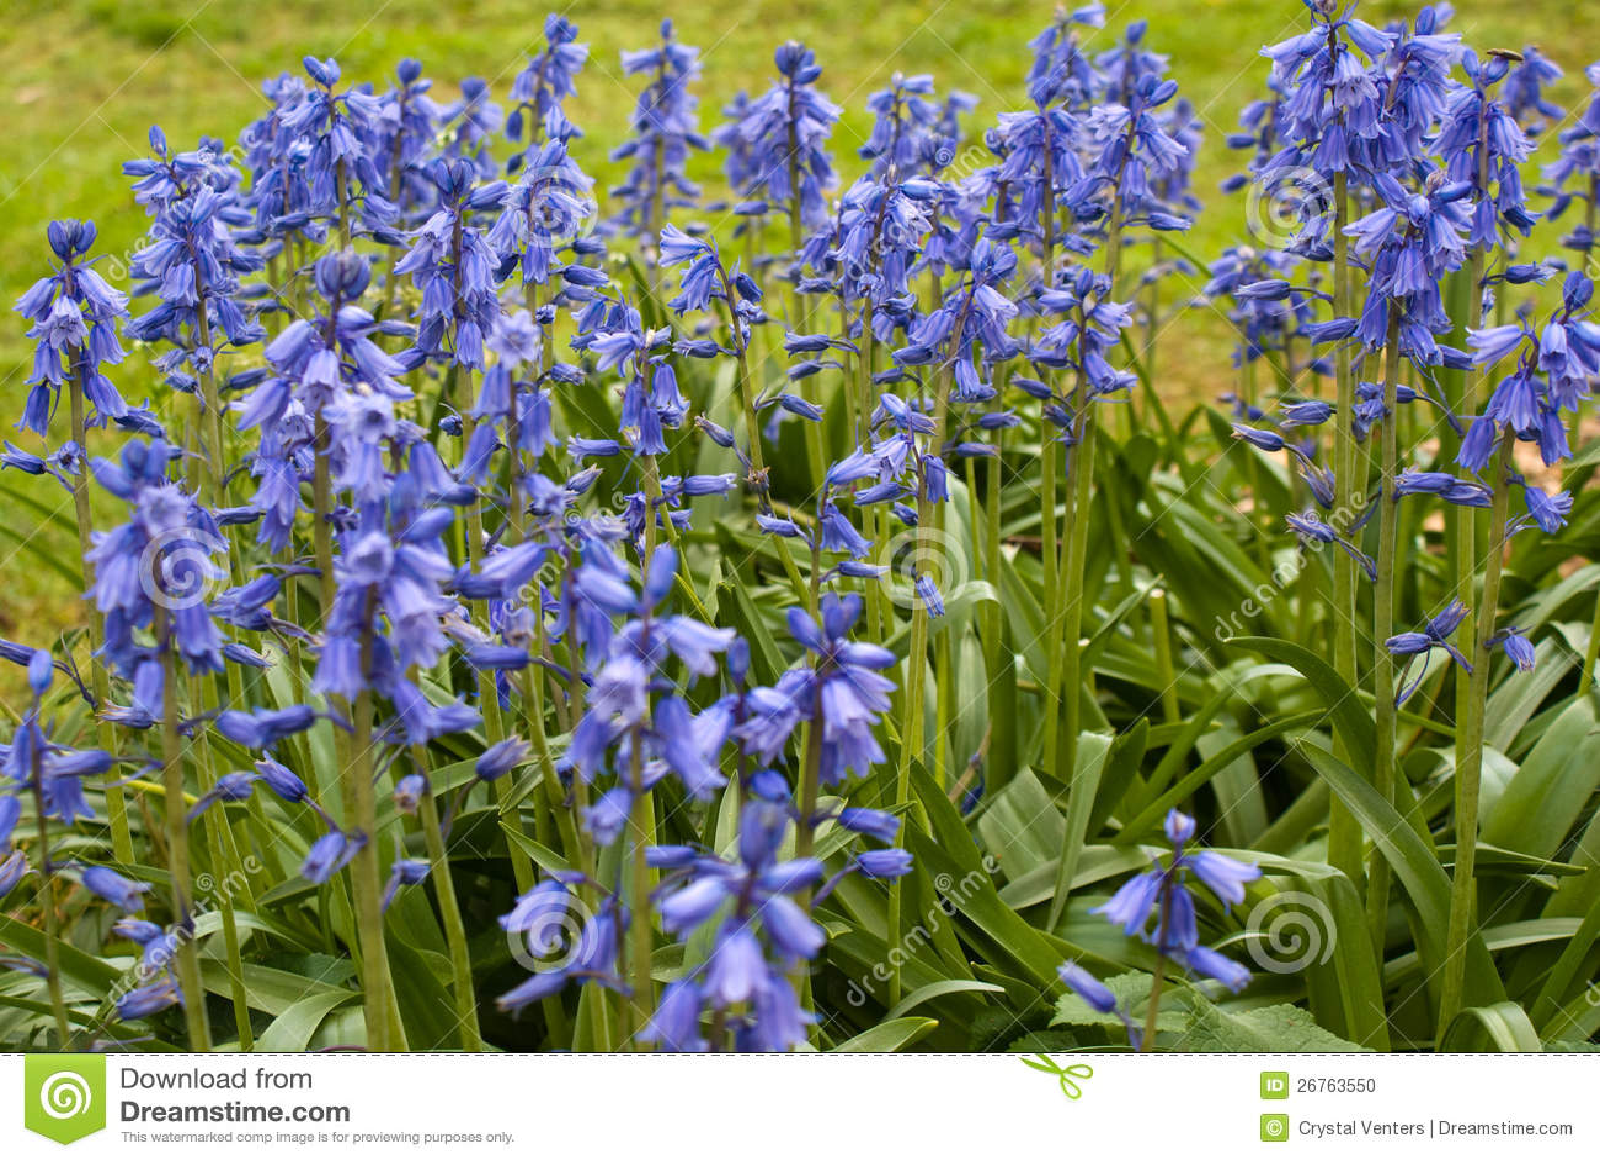 Spanish Bluebells Stock Image